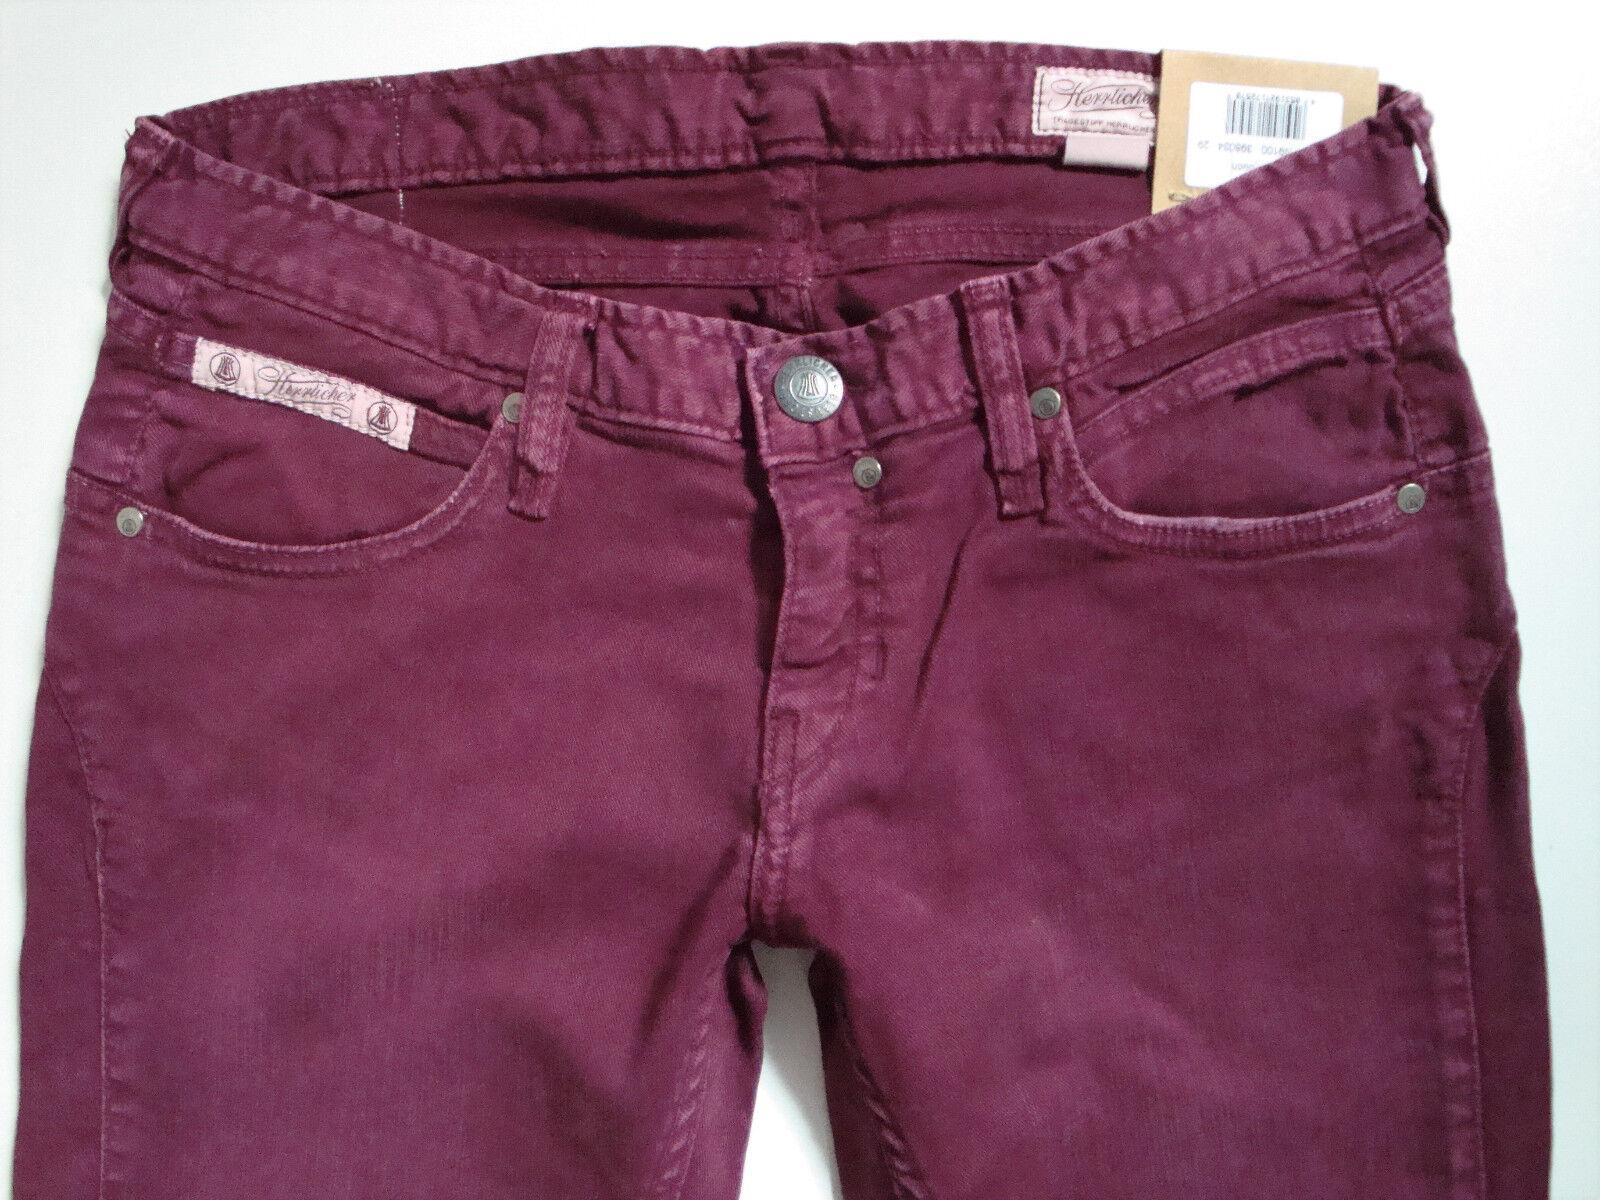 HERRLICHER  Jeans  TOUCH  5630 N9100  Rosa  Beere  W26, W27, W29, W30  Neu